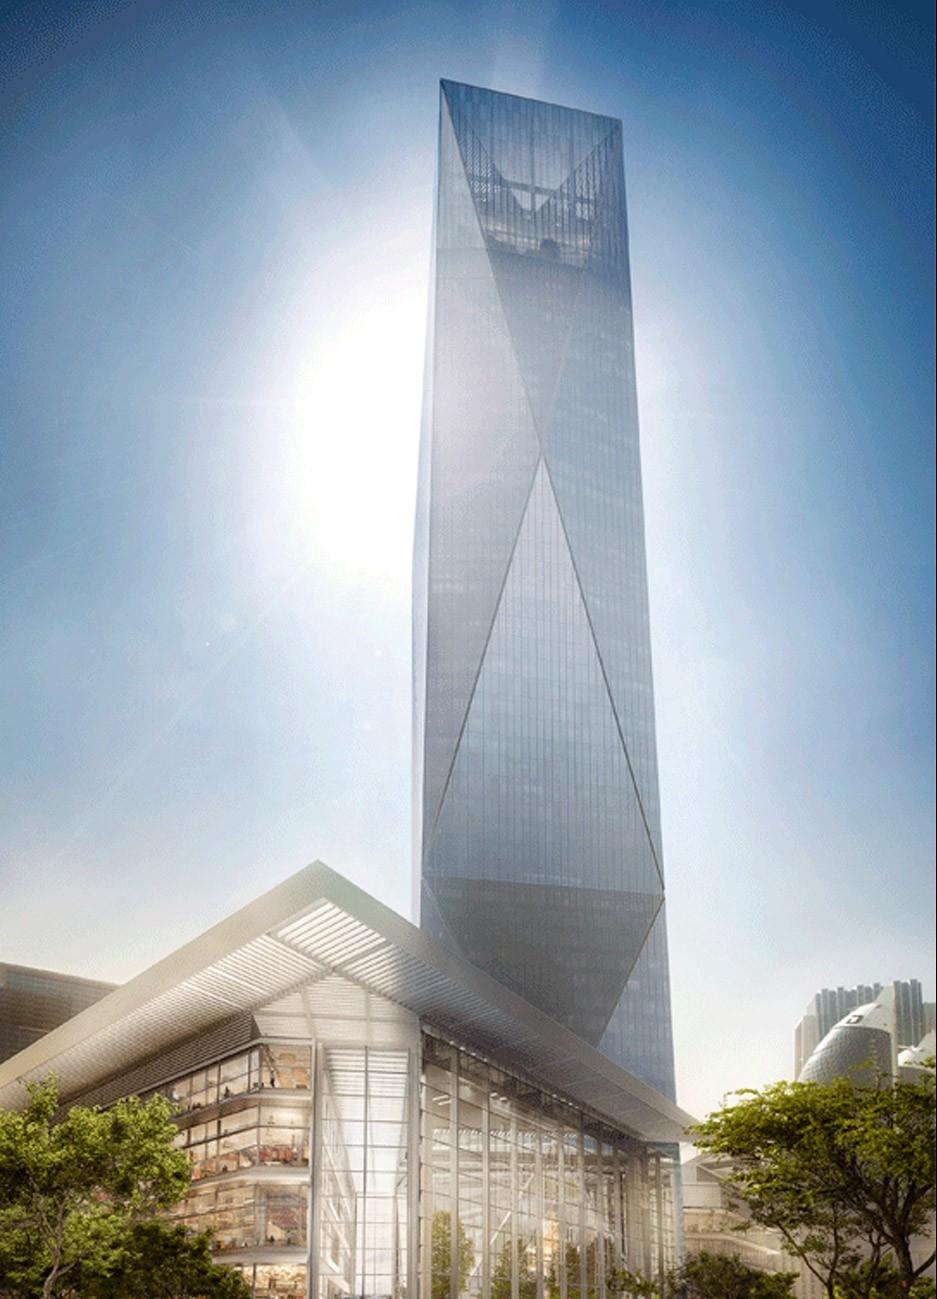 Foster and Partners unveil plans for Dubai skyscraper